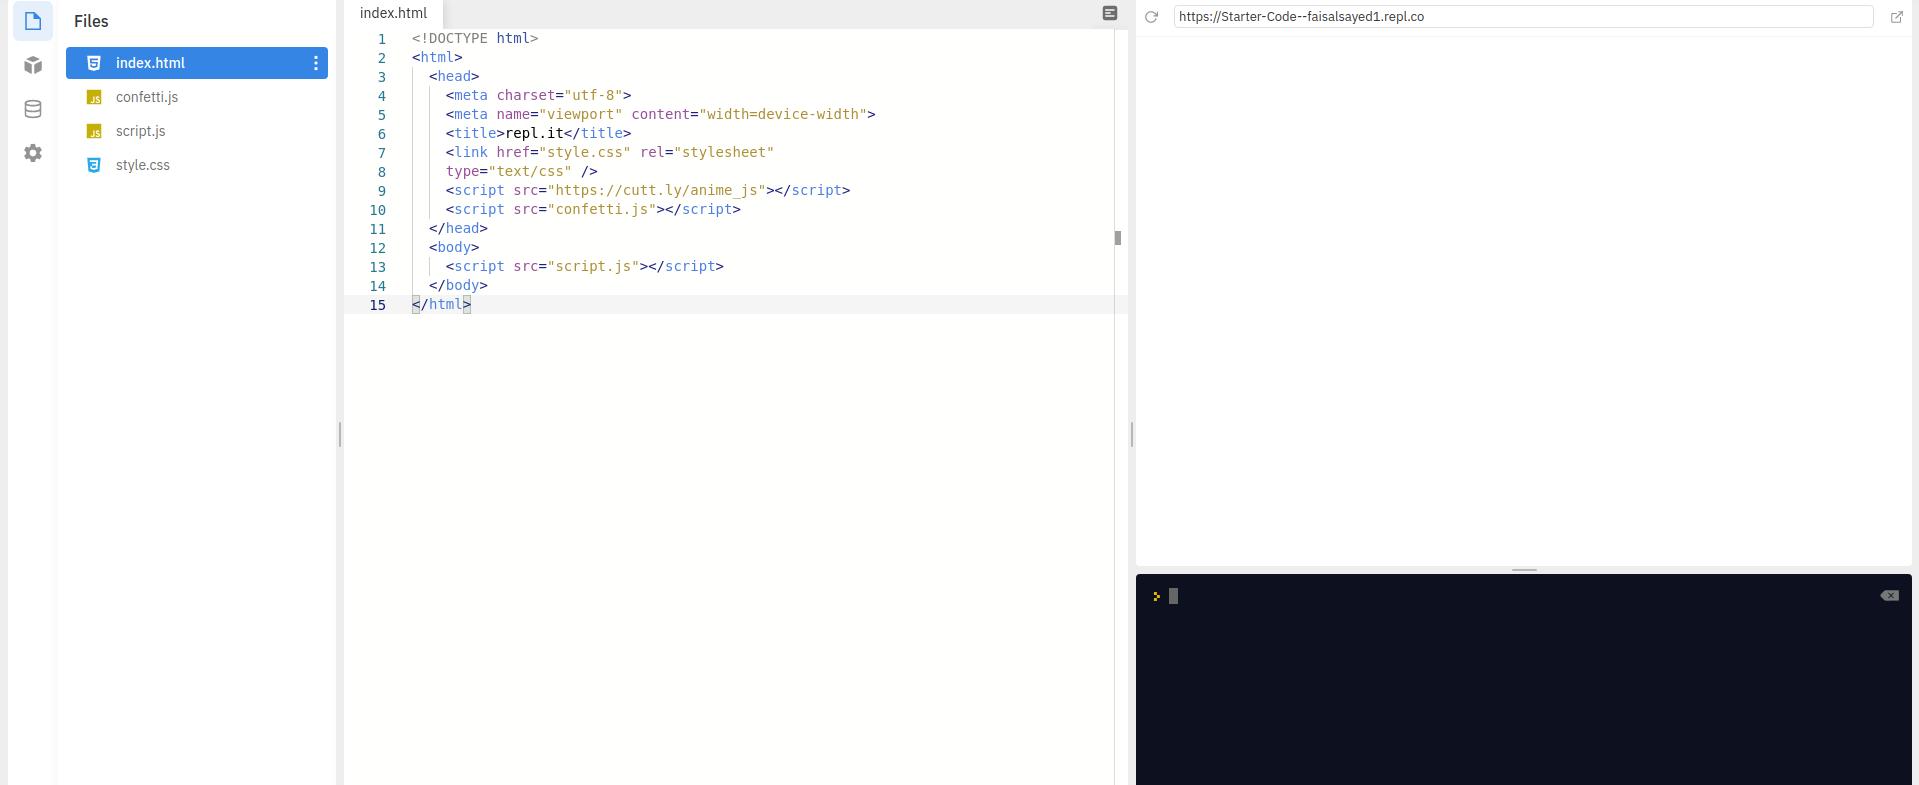 Screenshot of repl.it interface